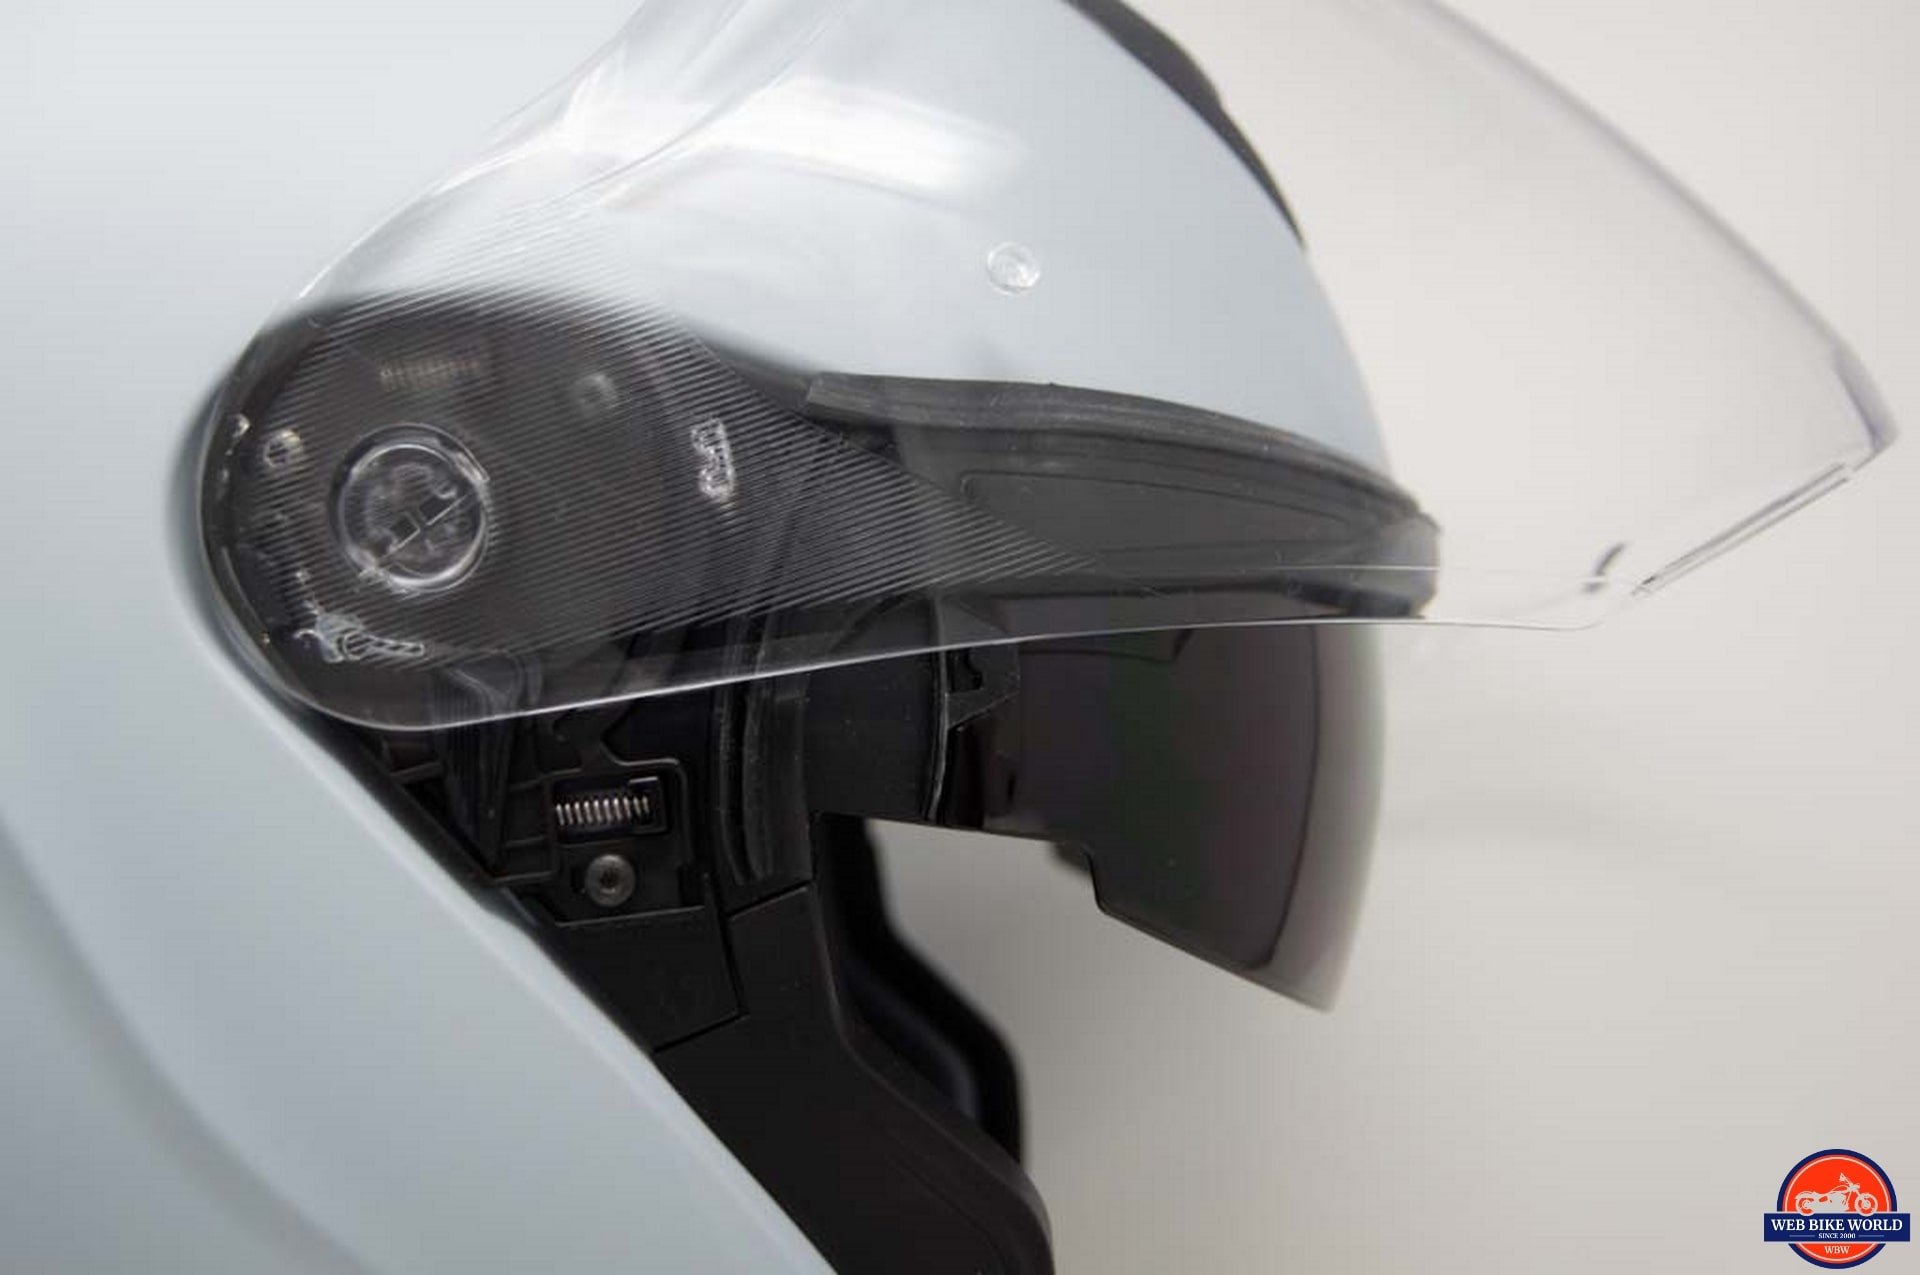 Schuberth M1 Pro visor open